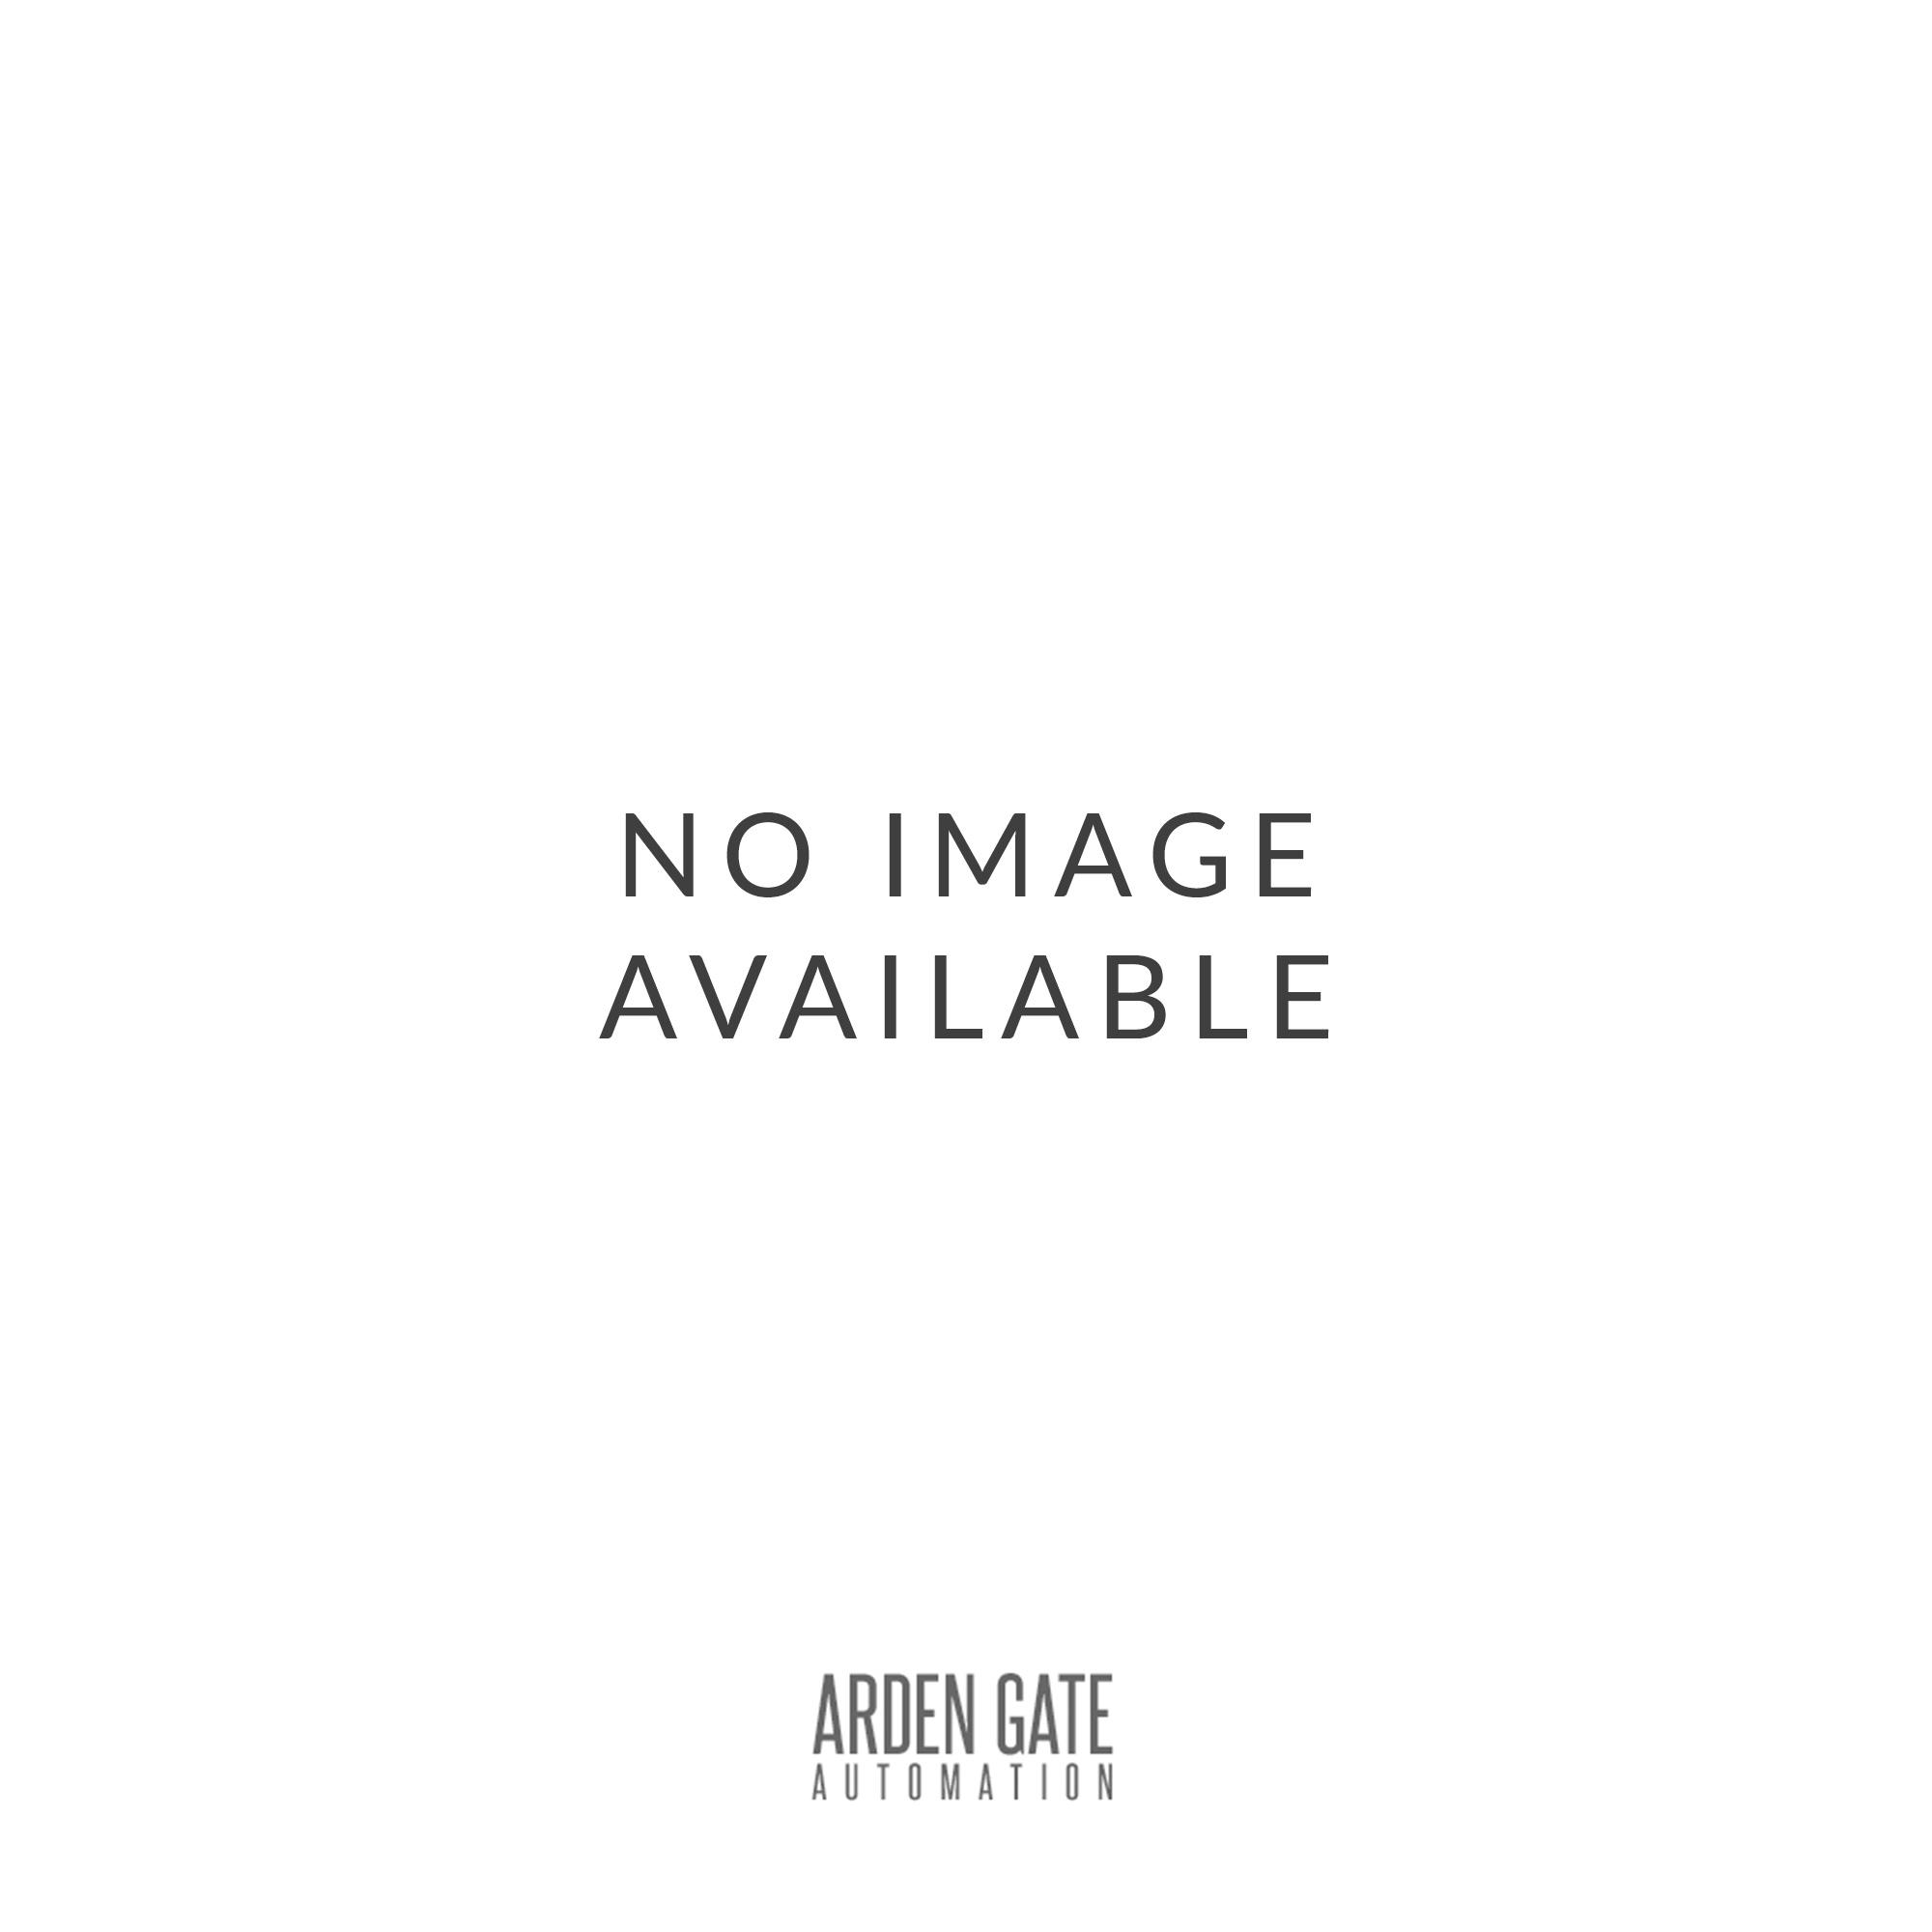 1 Channel External Transmitter, Rolling Code